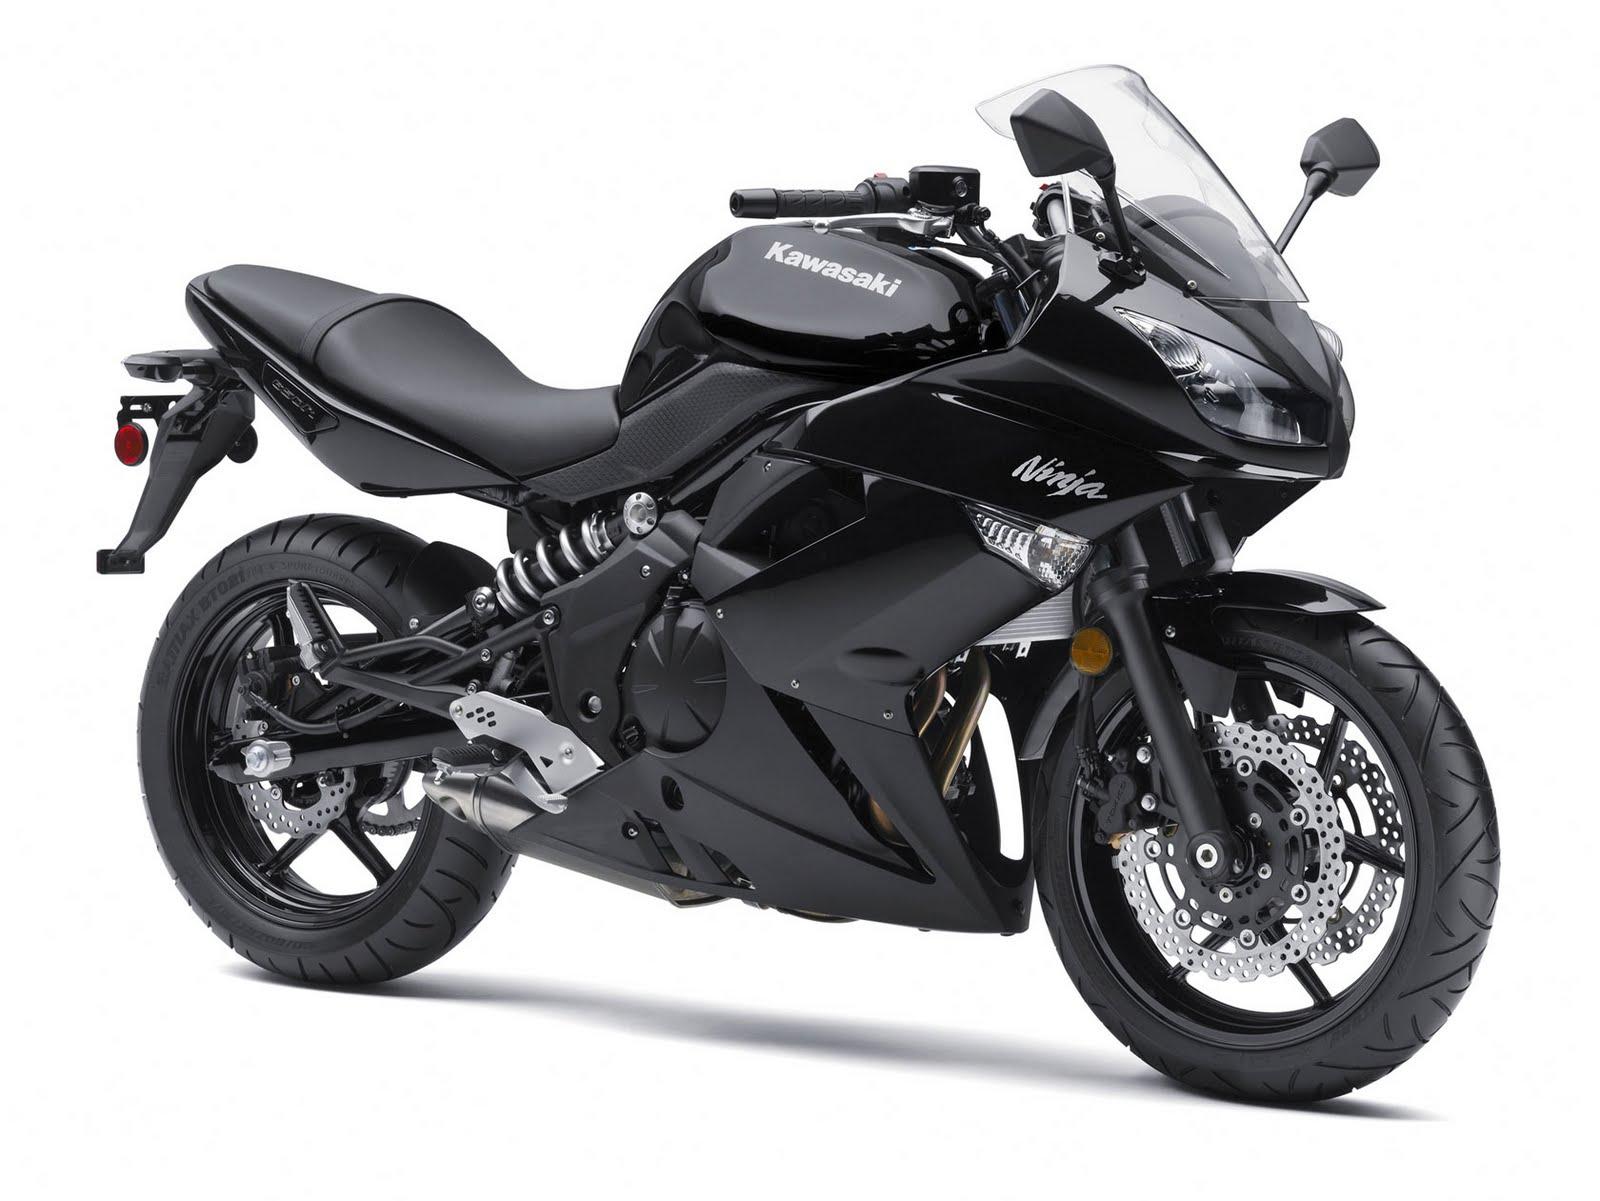 http://4.bp.blogspot.com/-fFltG0kjDiA/TeVKkTS82EI/AAAAAAAAAqo/HP0zrx6i91o/s1600/2011-Kawasaki-Ninja-650R-Black-Color.jpg